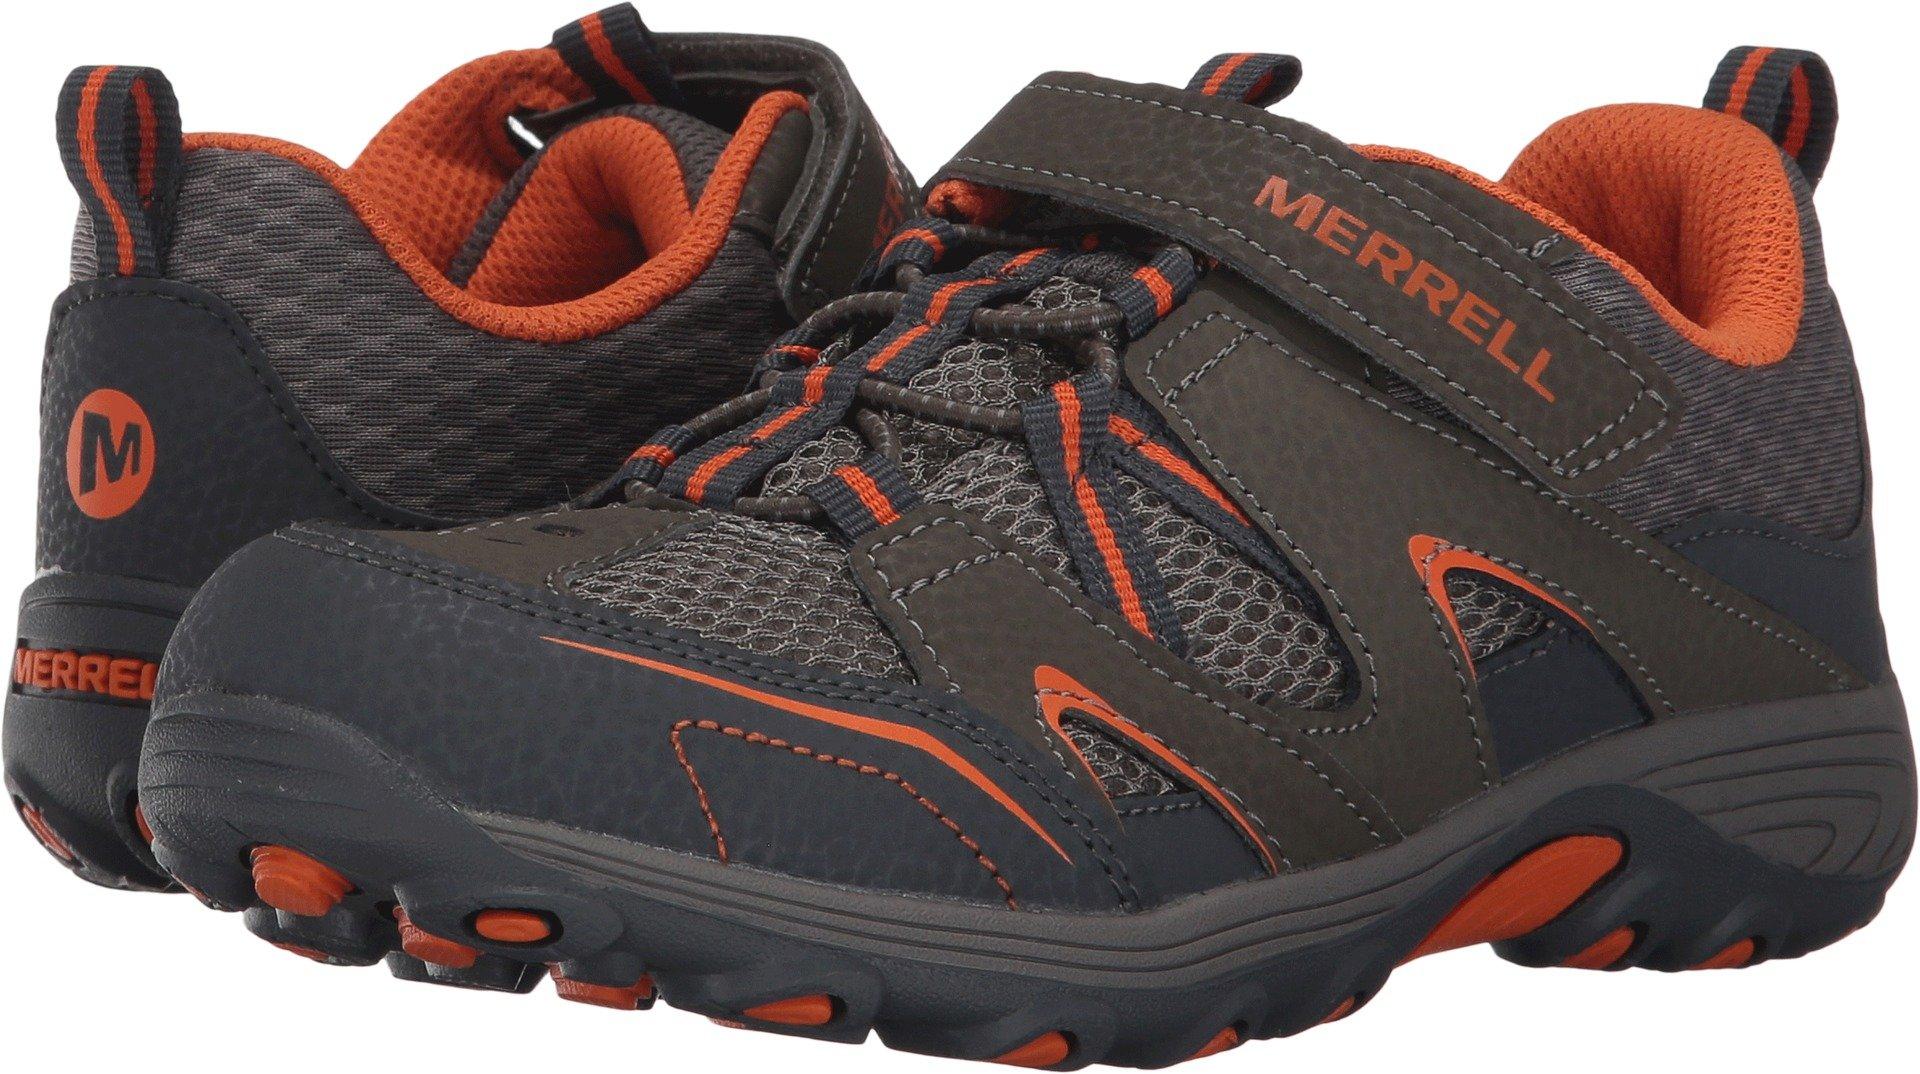 Merrell Trail Chaser Hiking Shoe (Little Kid/Big Kid), Gunsmoke/Orange, 4 M US Big Kid